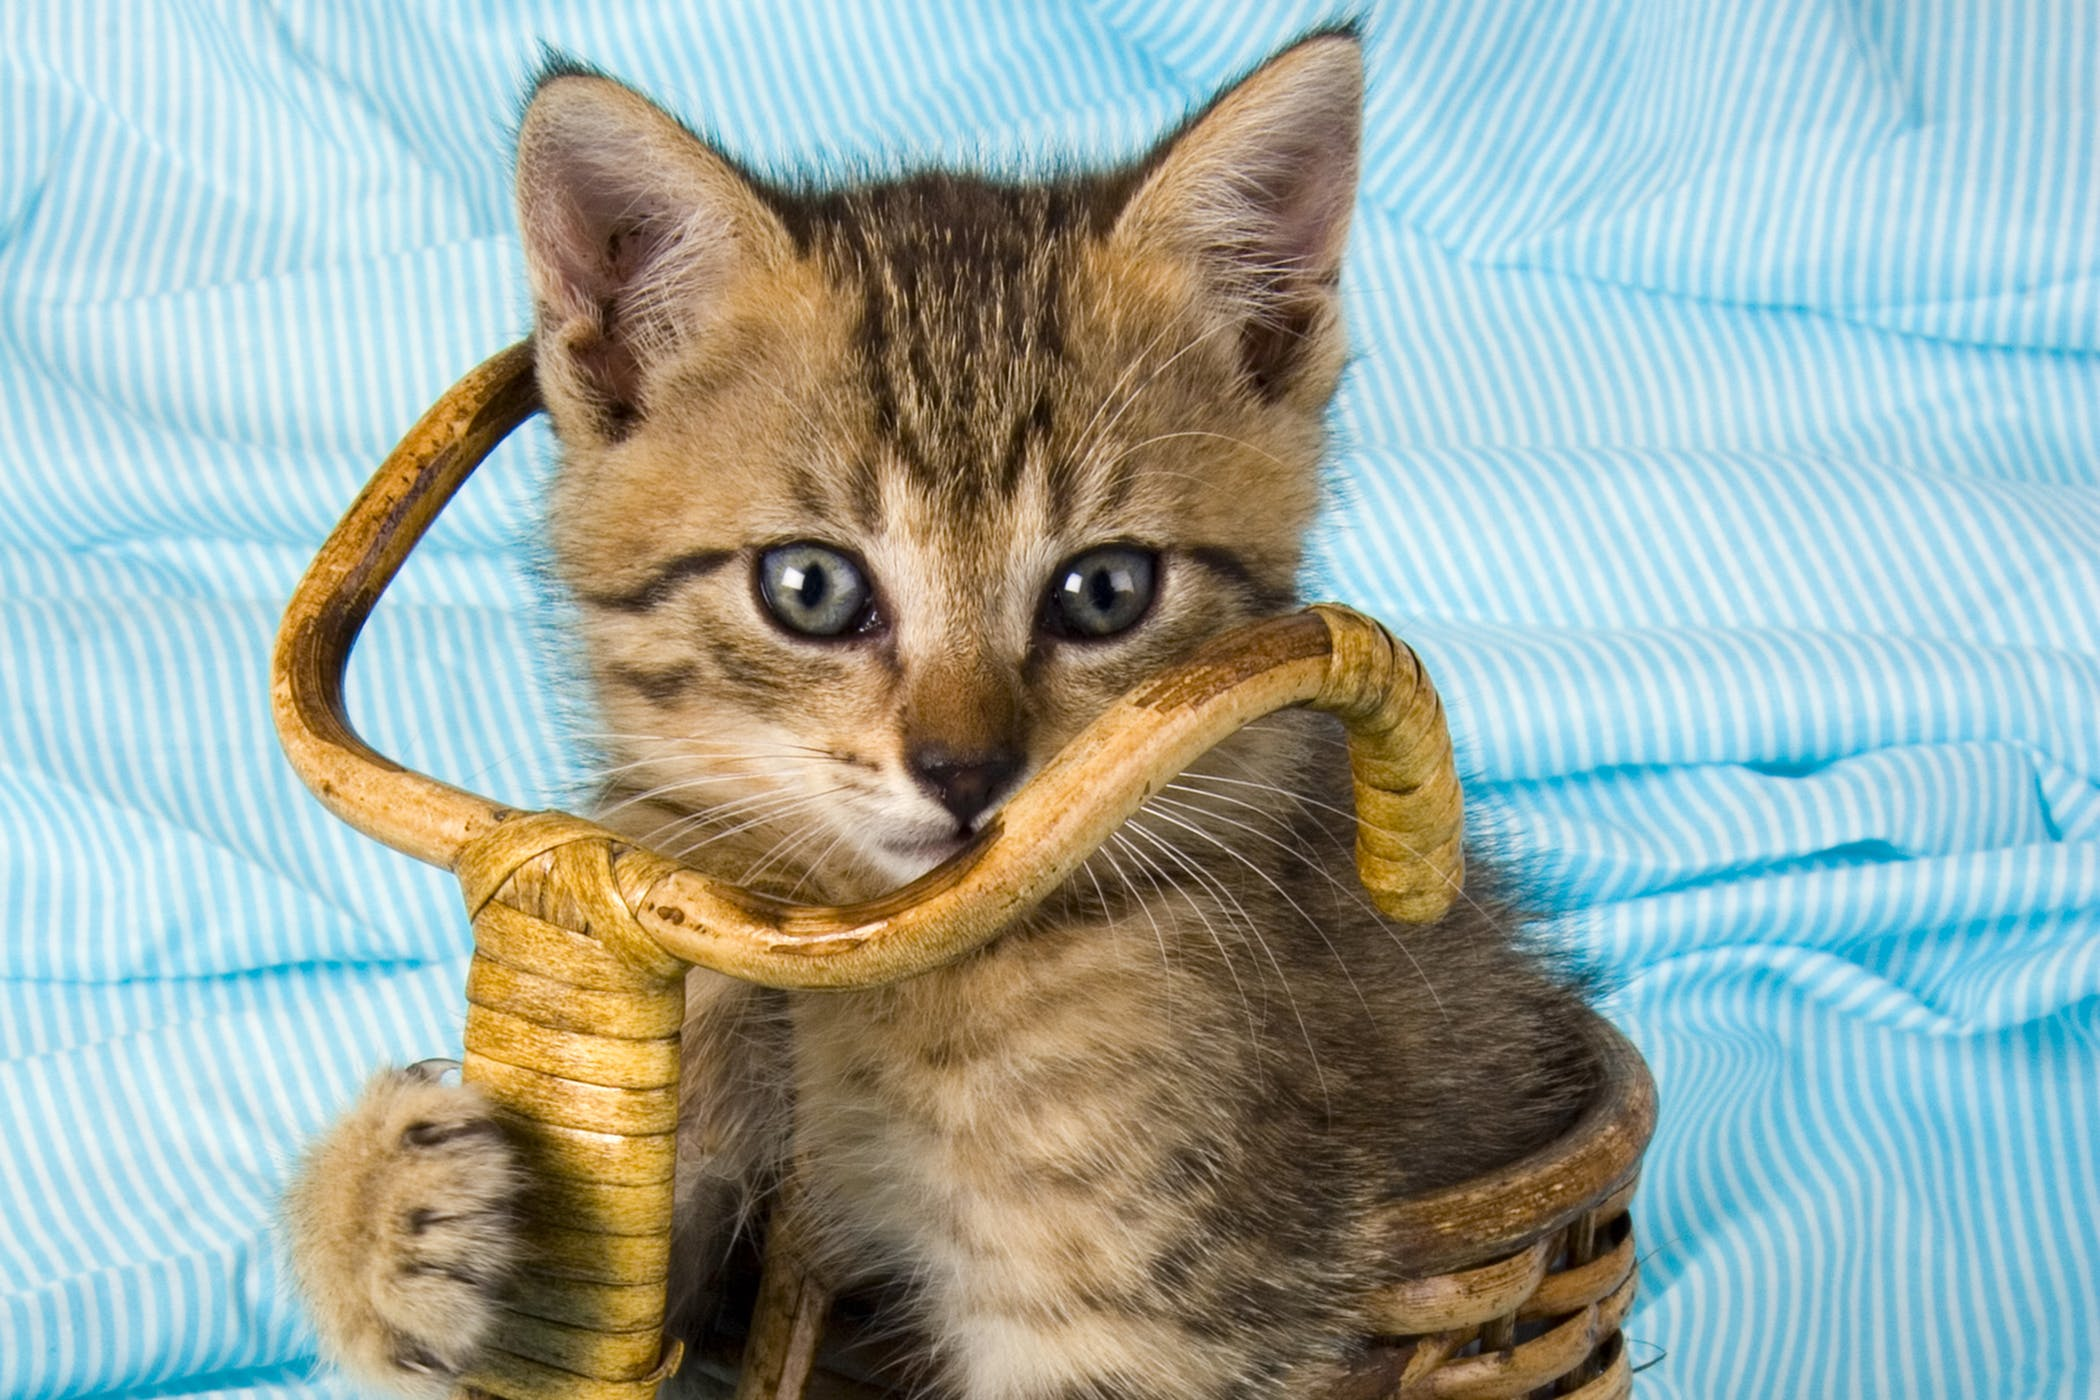 Methemoglobinemia in Cats